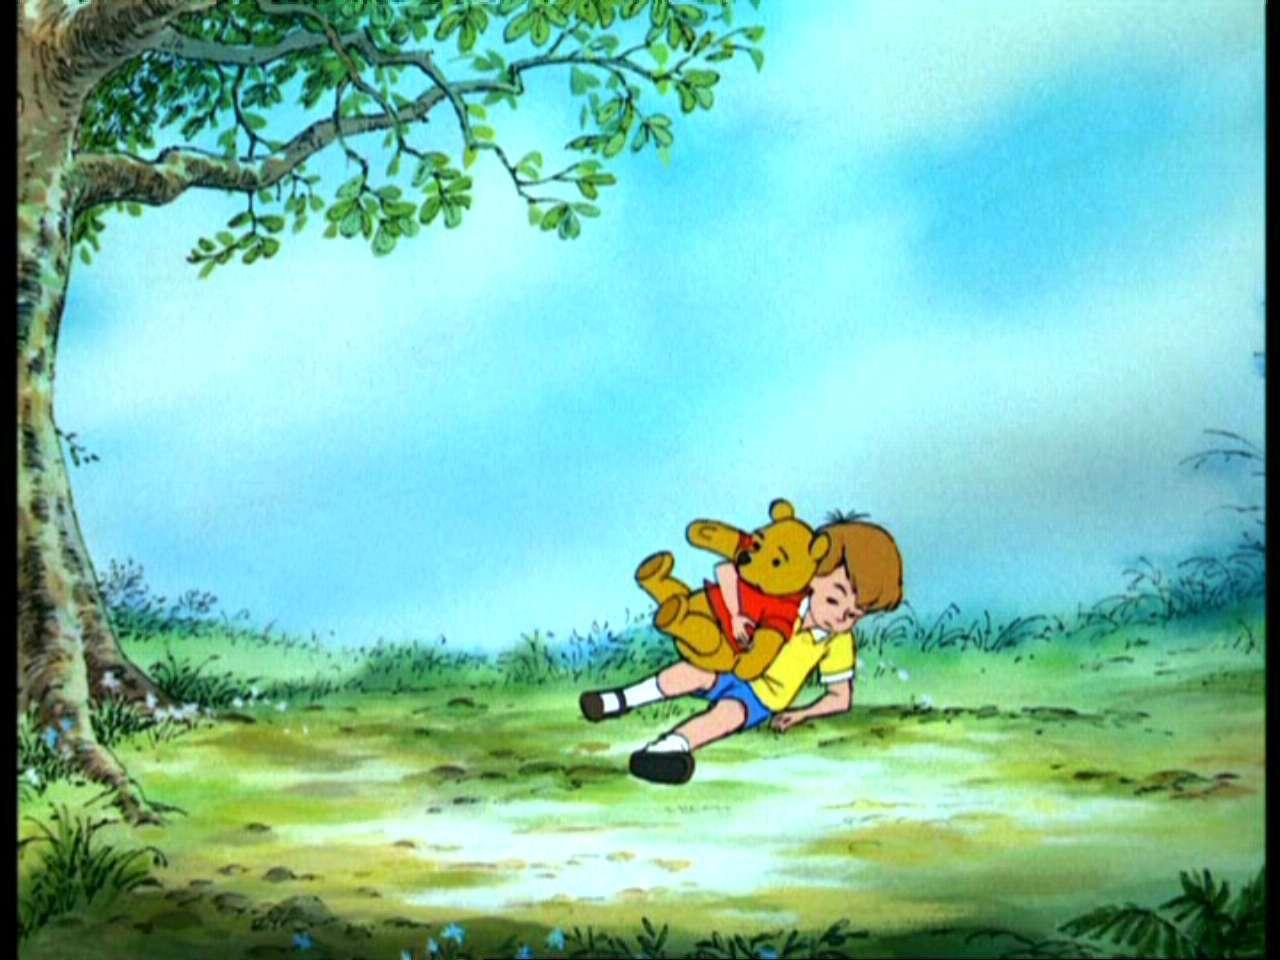 Winnie the Pooh and the Hunny albero